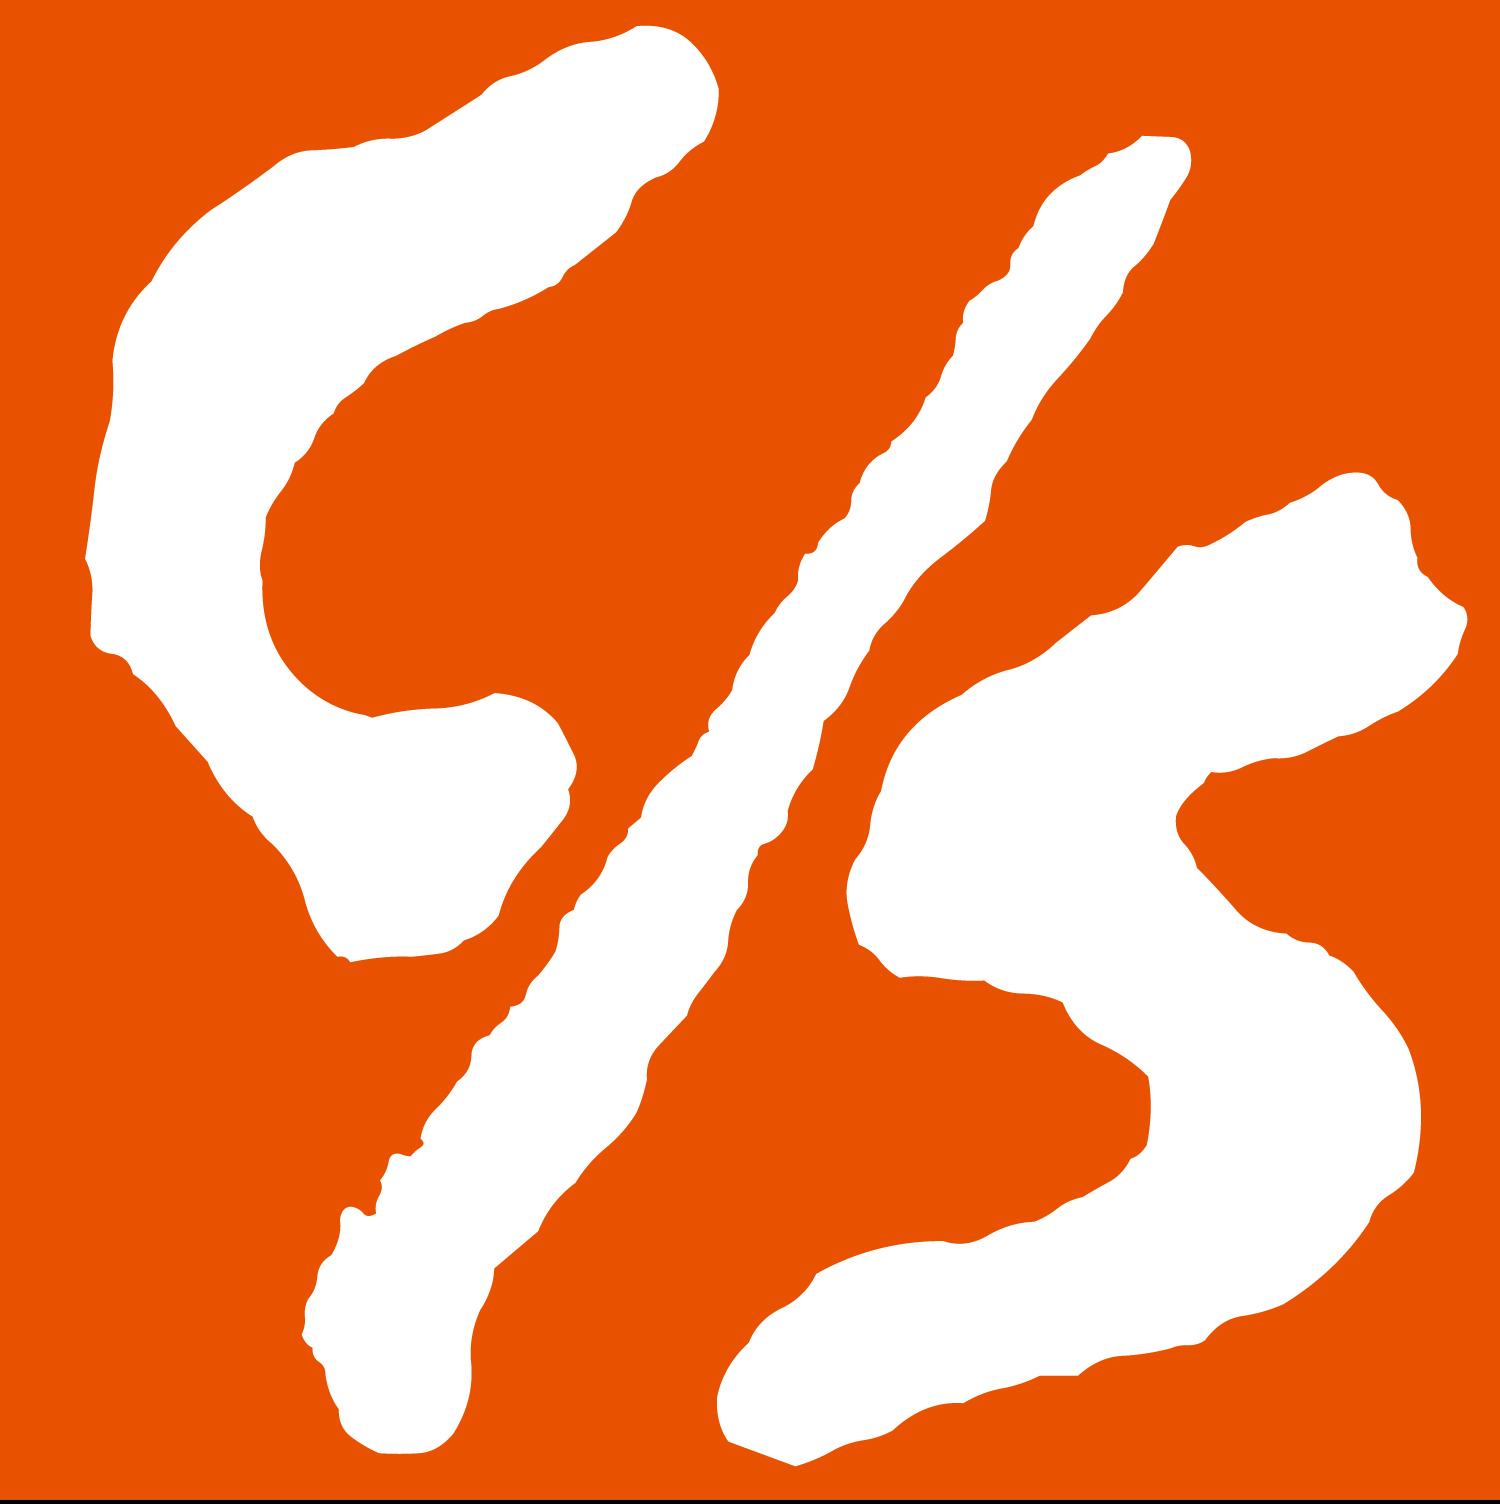 logo orange cmyk1MB.jpg